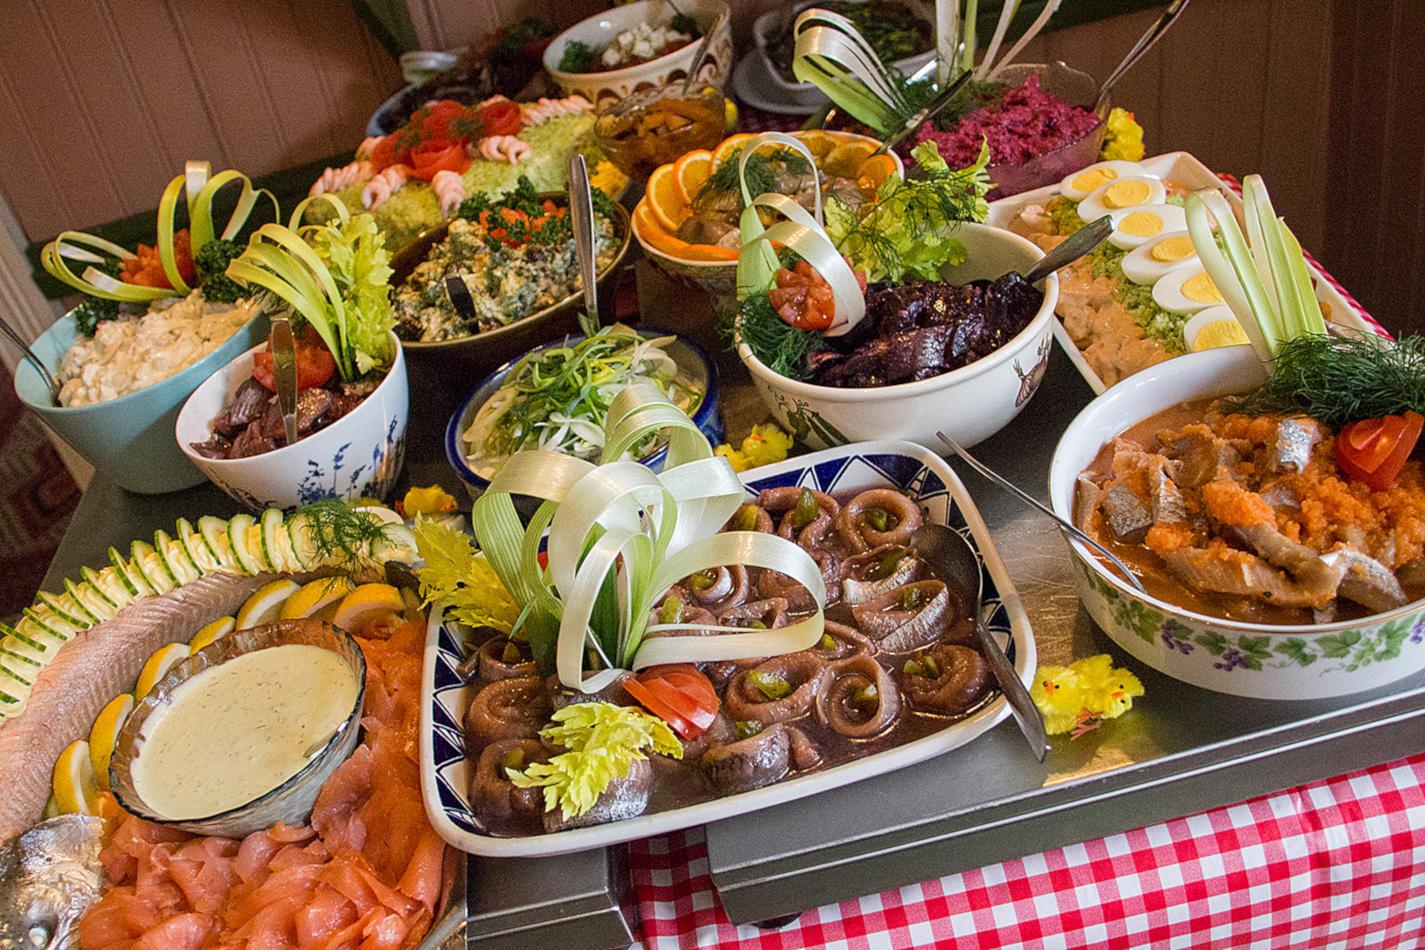 Baklandet Skydsstation: Traditional home-cooked food in world-famous venue - Scan Magazine